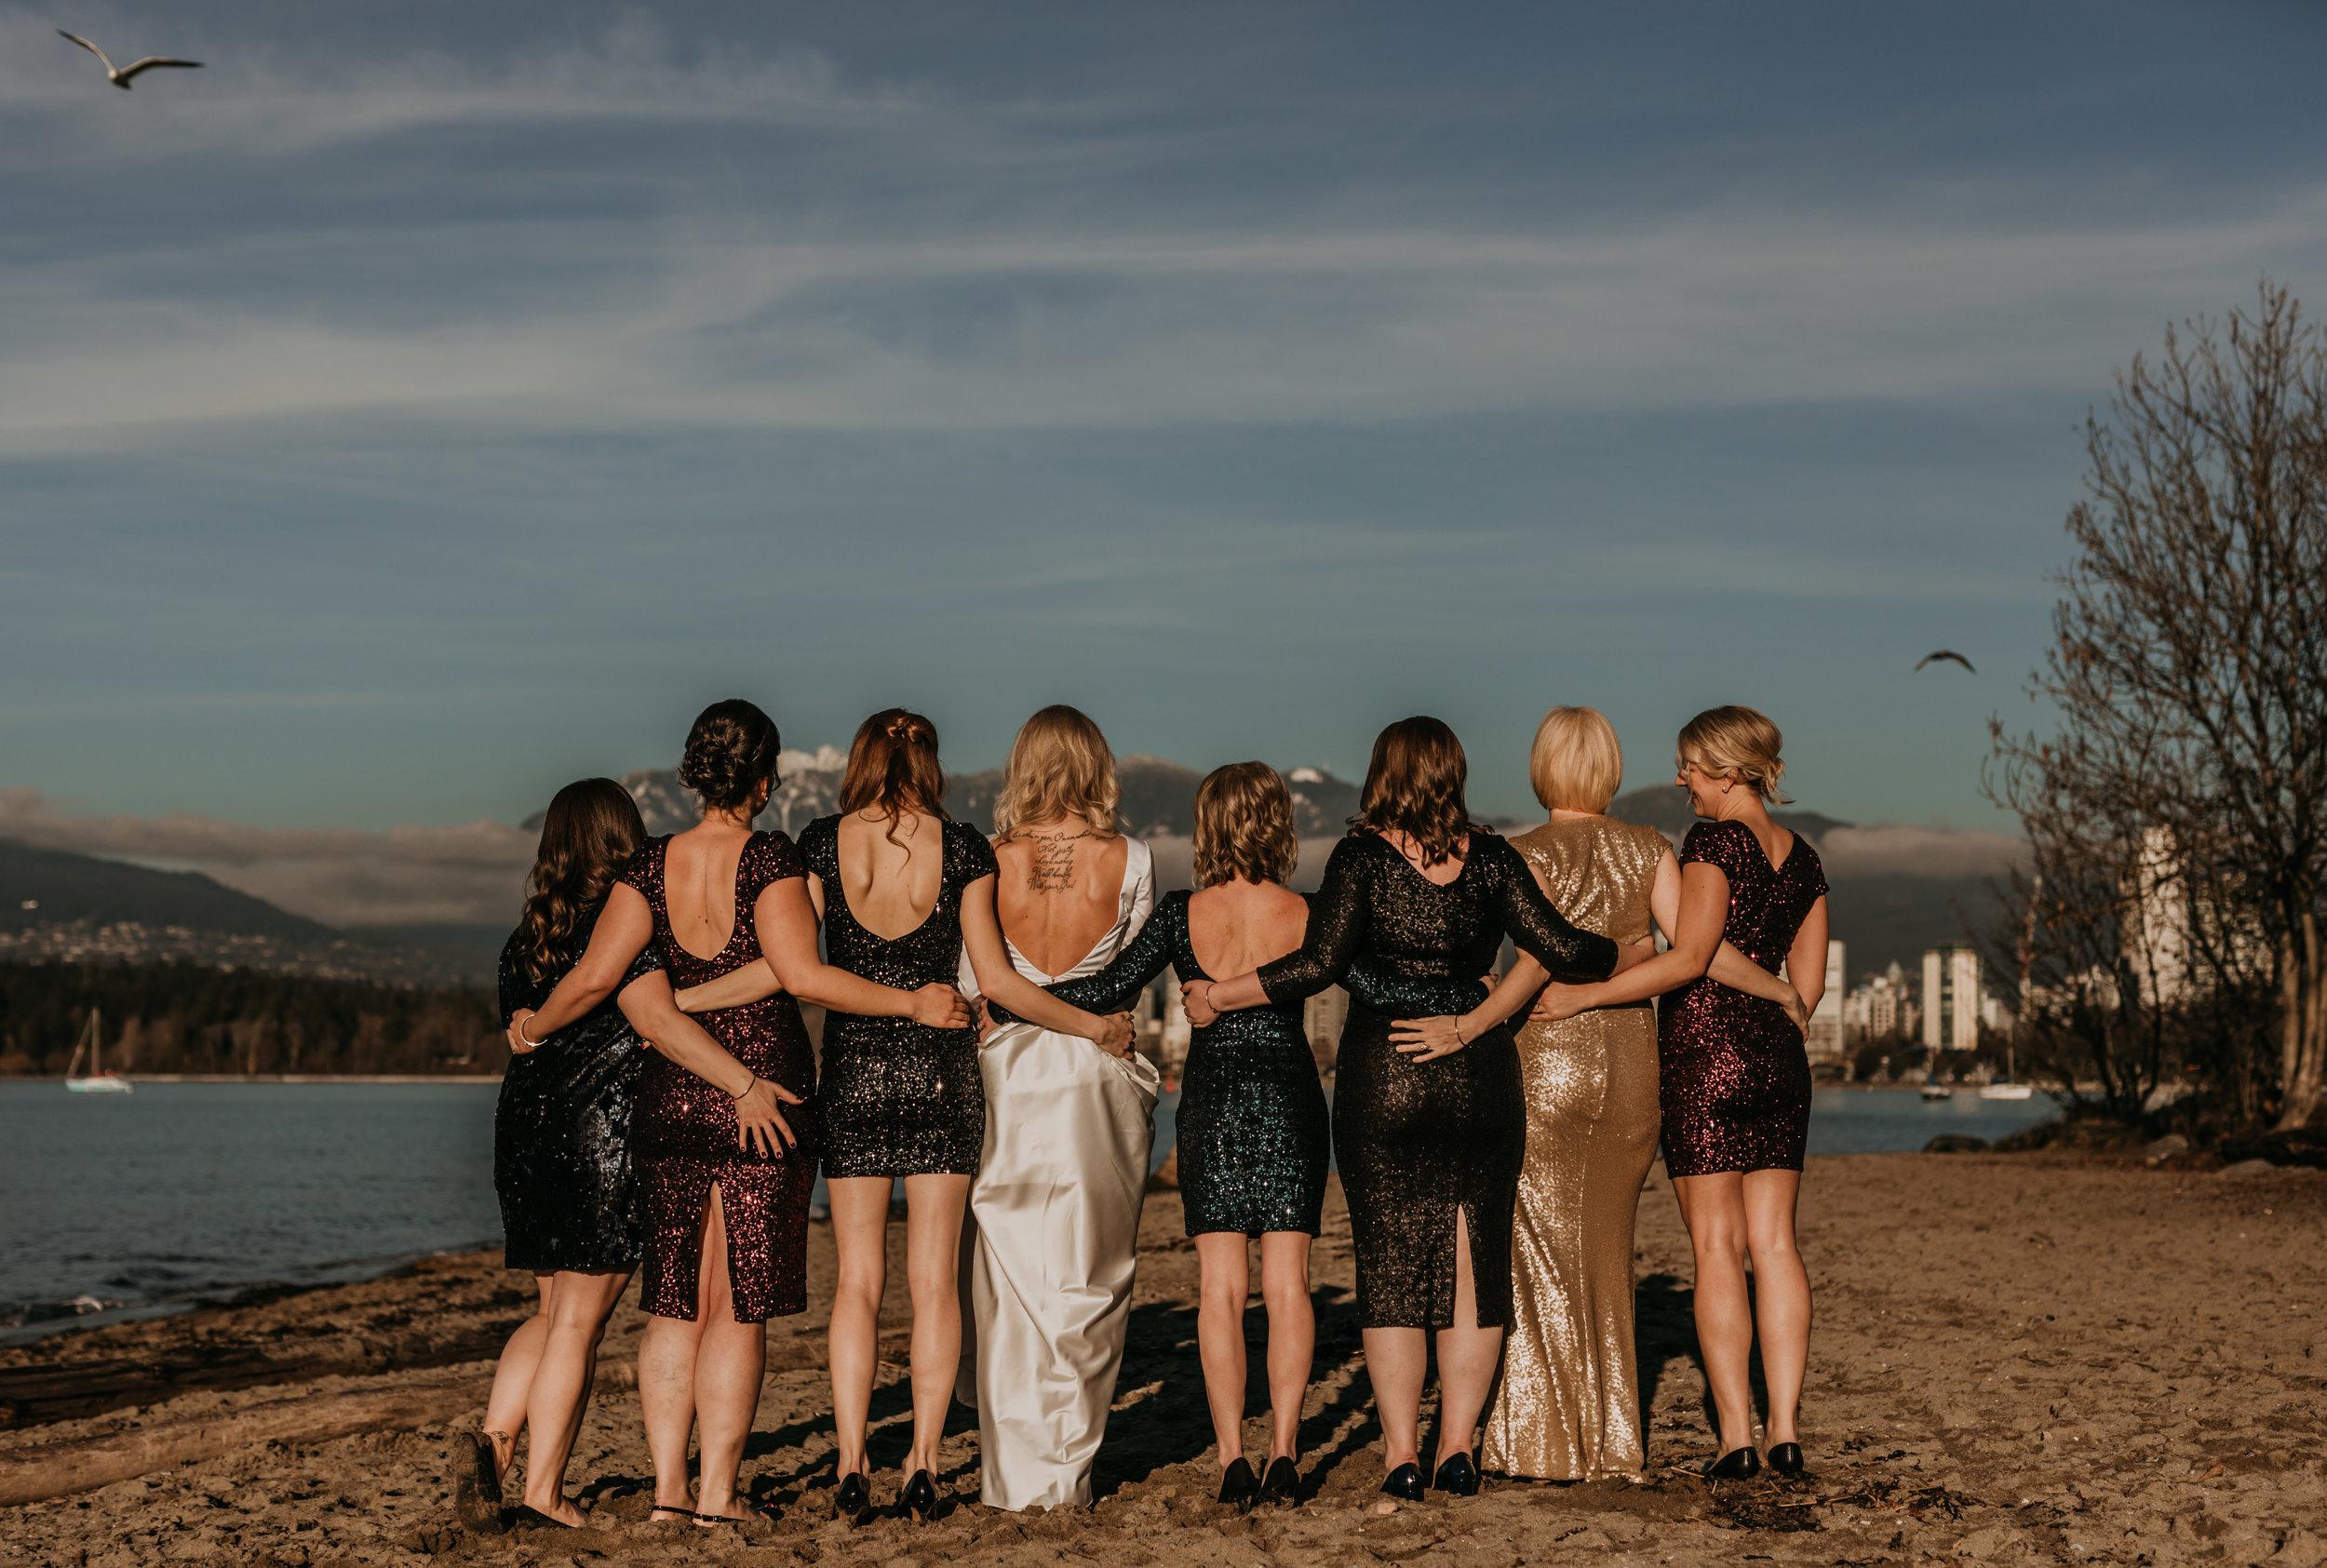 Vancouver Wedding Photos - Vegan Wedding Photographer - New Years Eve Wedding Photos - Vancouver Wedding Photographer - Vancouver Wedding Videographer - 446.JPG